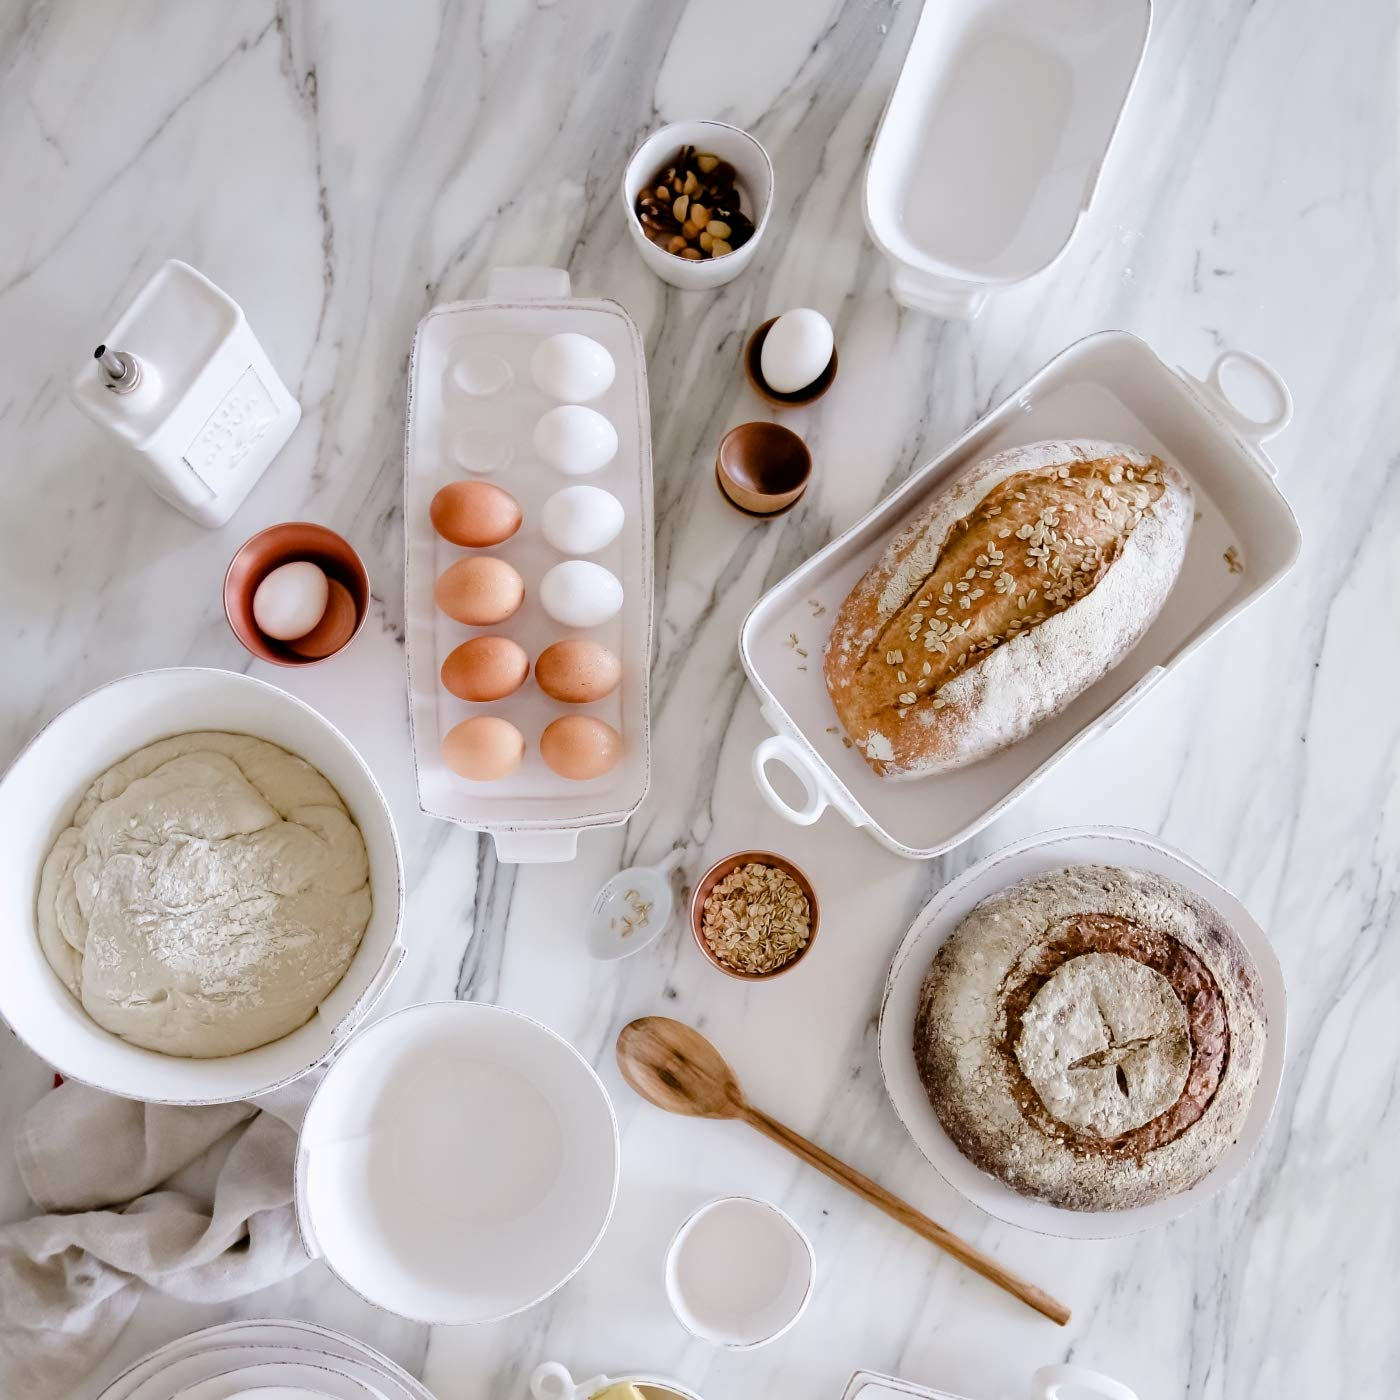 Vietri Lastra White Rectangular Baker by Vietri